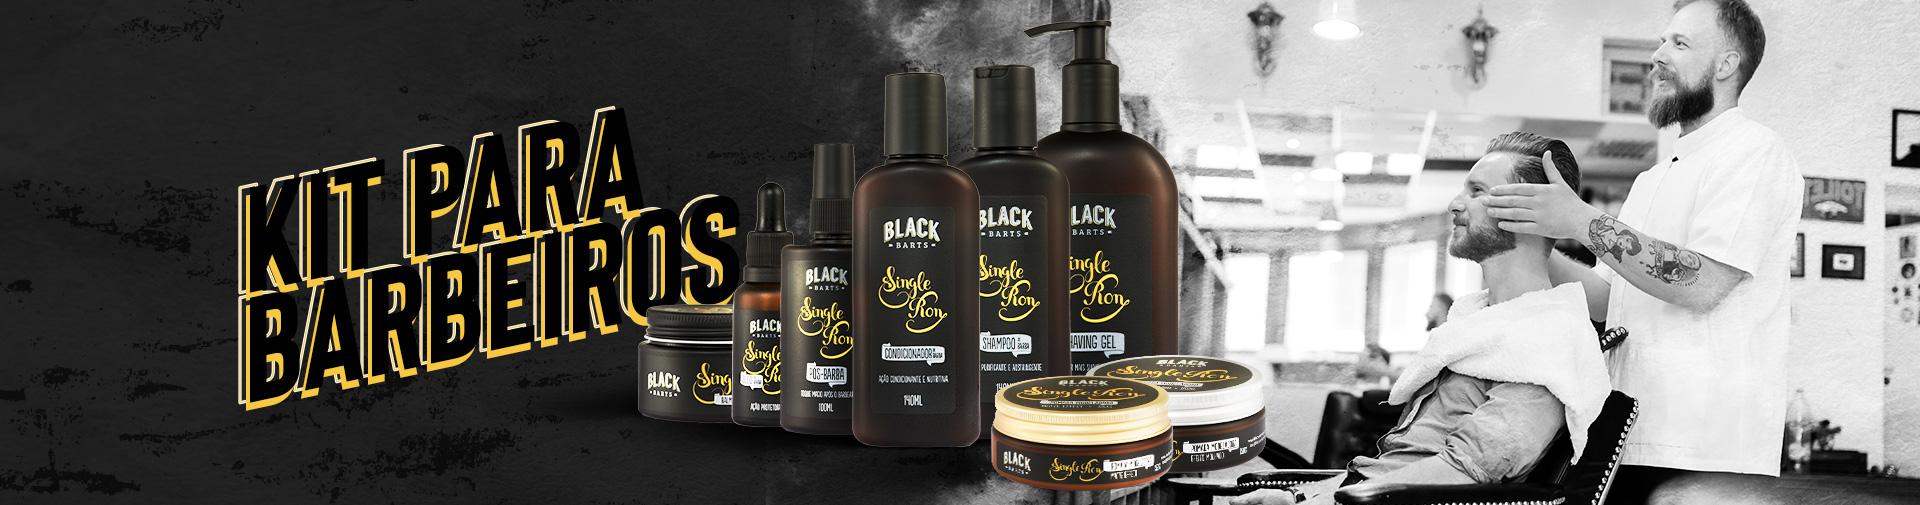 Black Julho Barbeiros